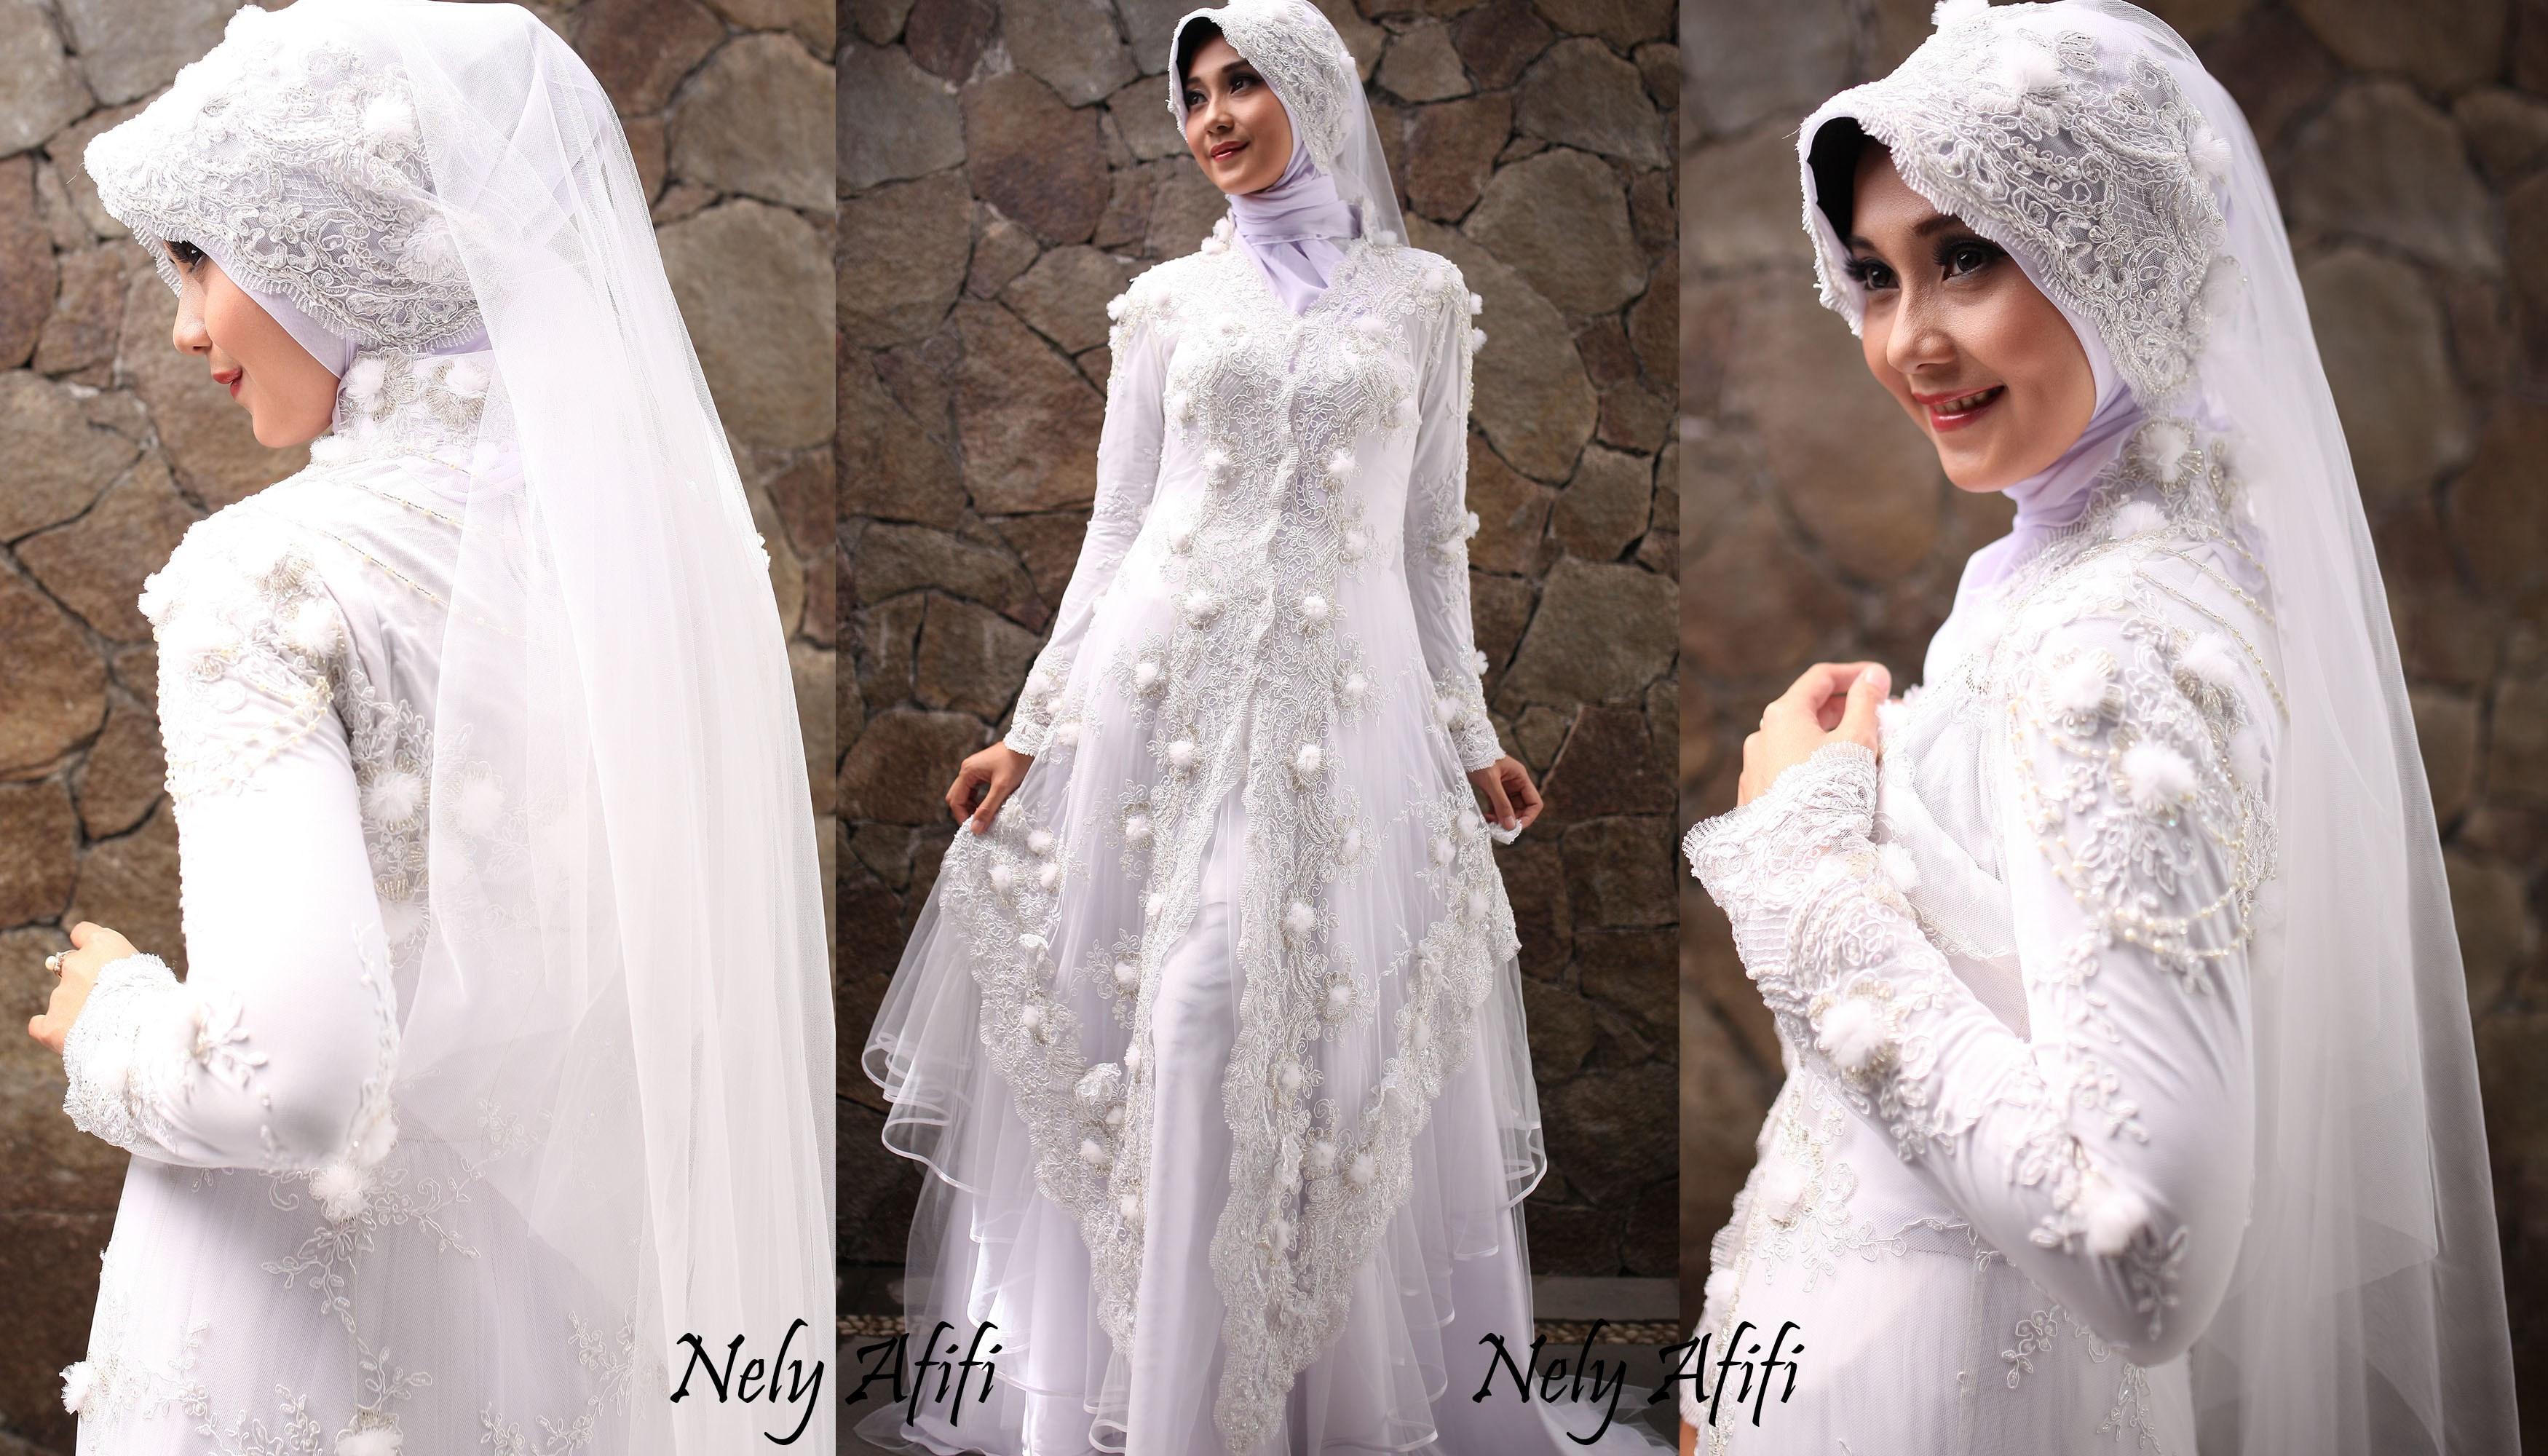 Gaun Pengantin Muslimah Modern Warna Pink Beautiful Foto Wanita Bercadar Modern Cantik Gaun Pengantin Muslimah